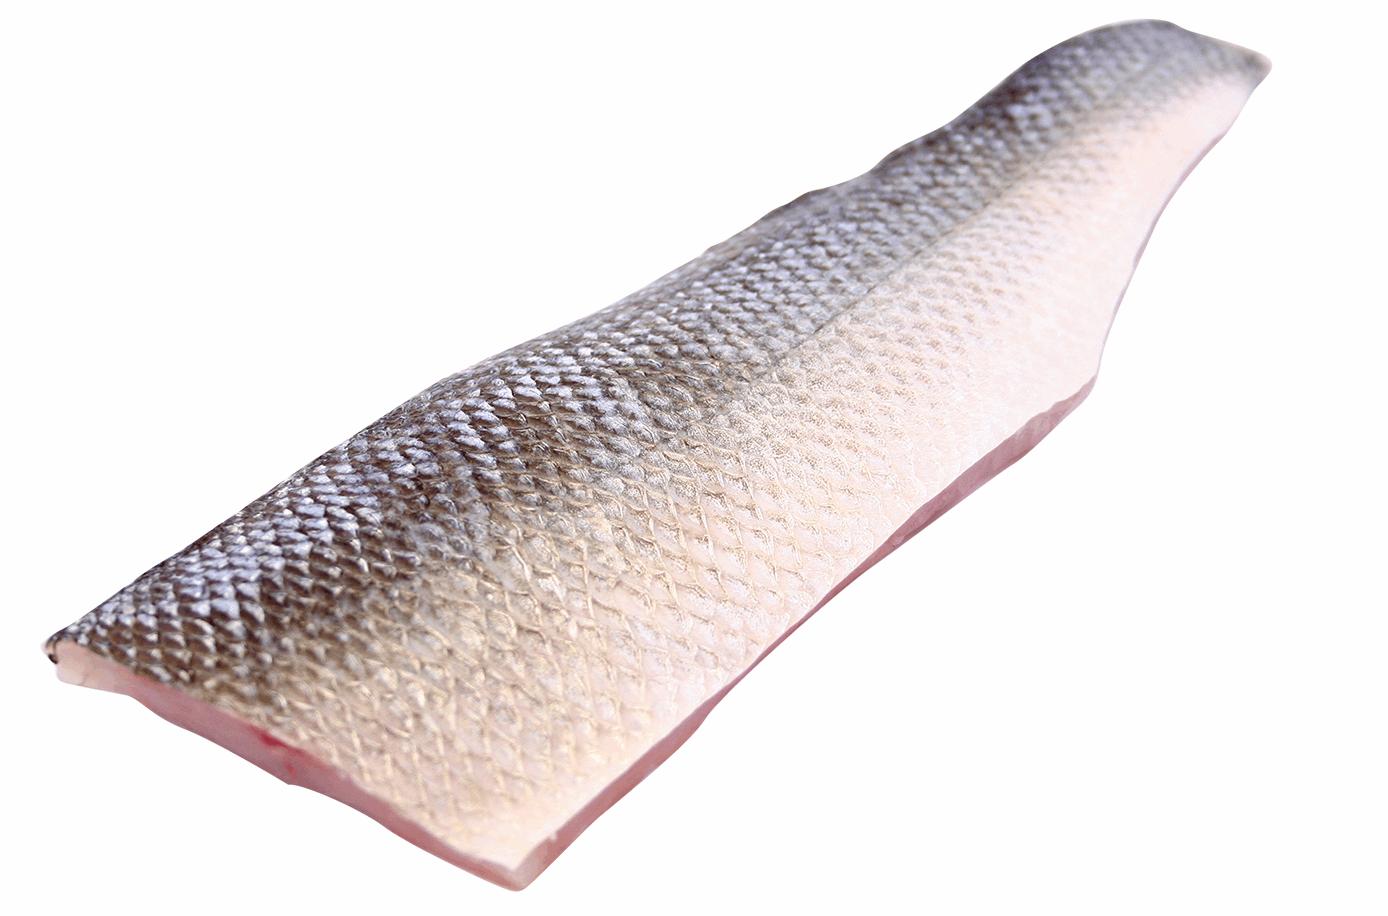 Productafbeelding WILD SEABASS FILET SKIN ON 600-900GR